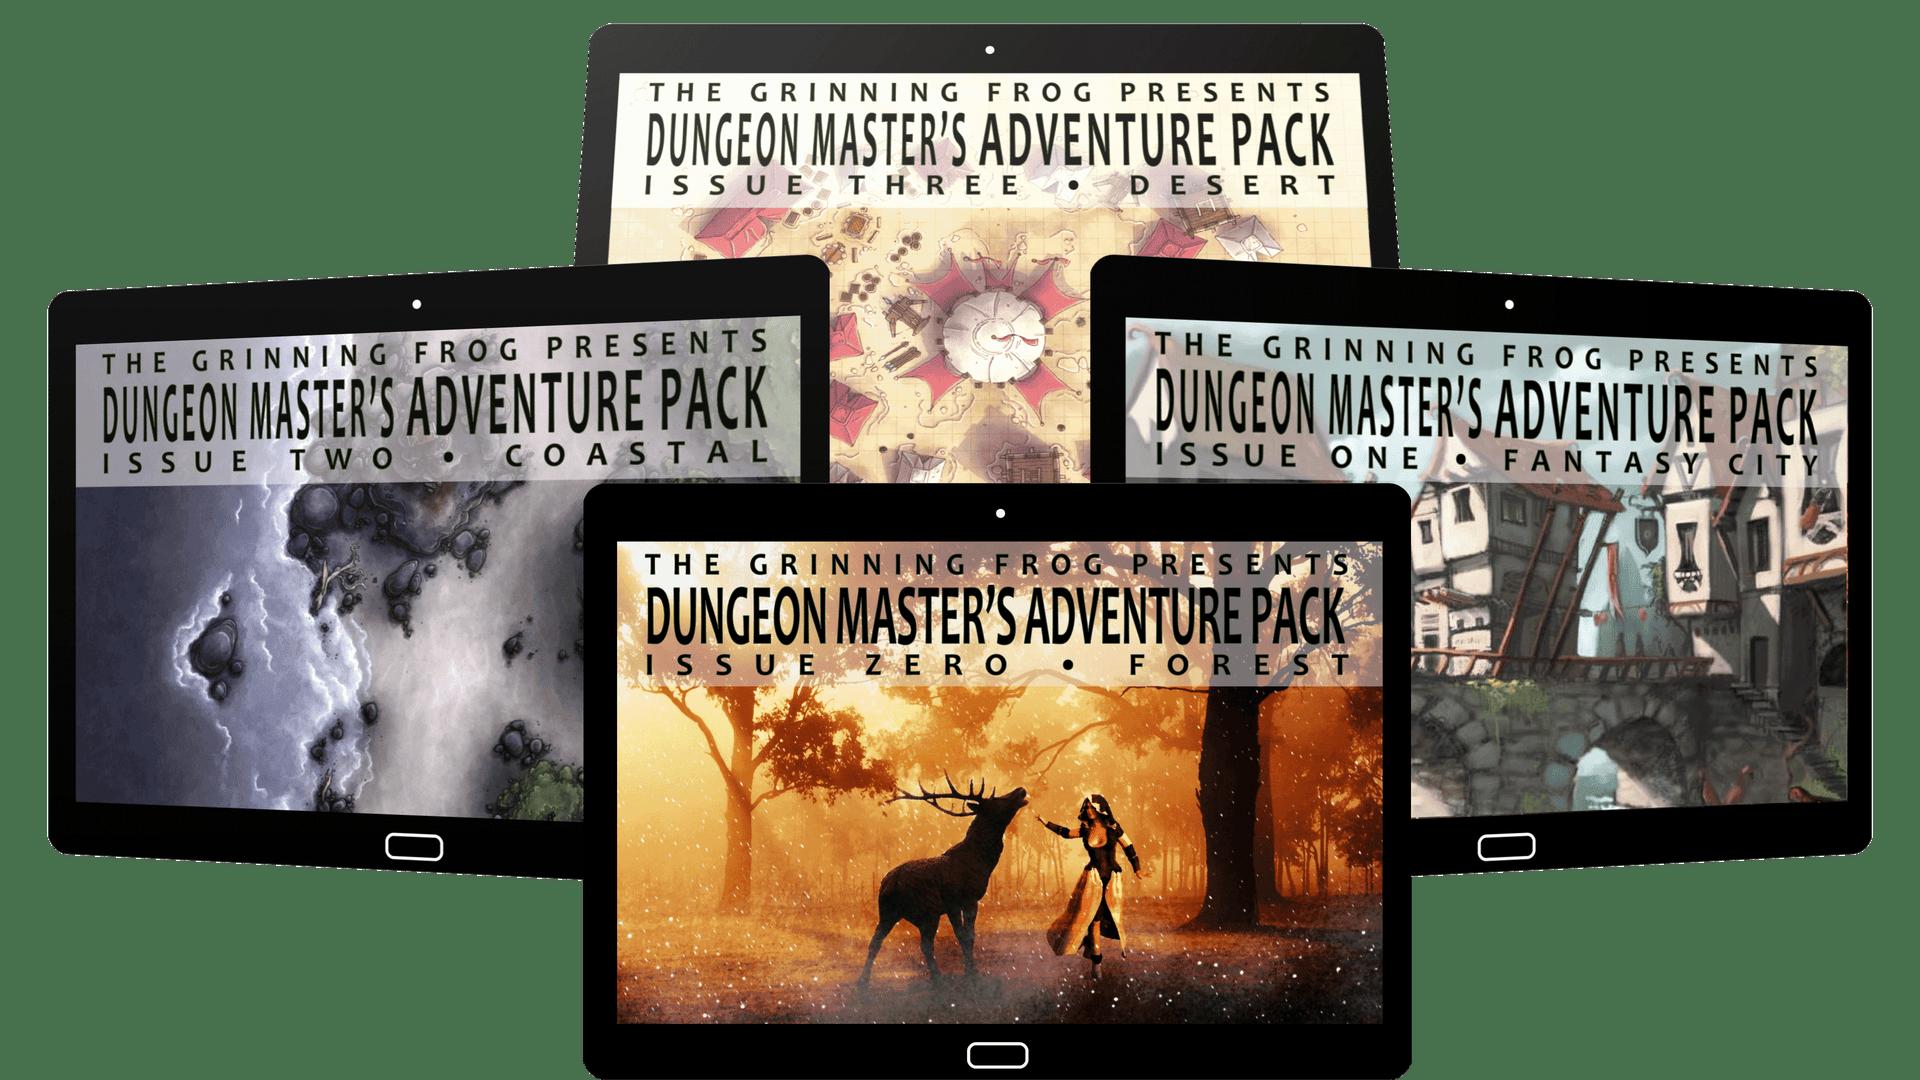 Dungeon Master's adventure pack